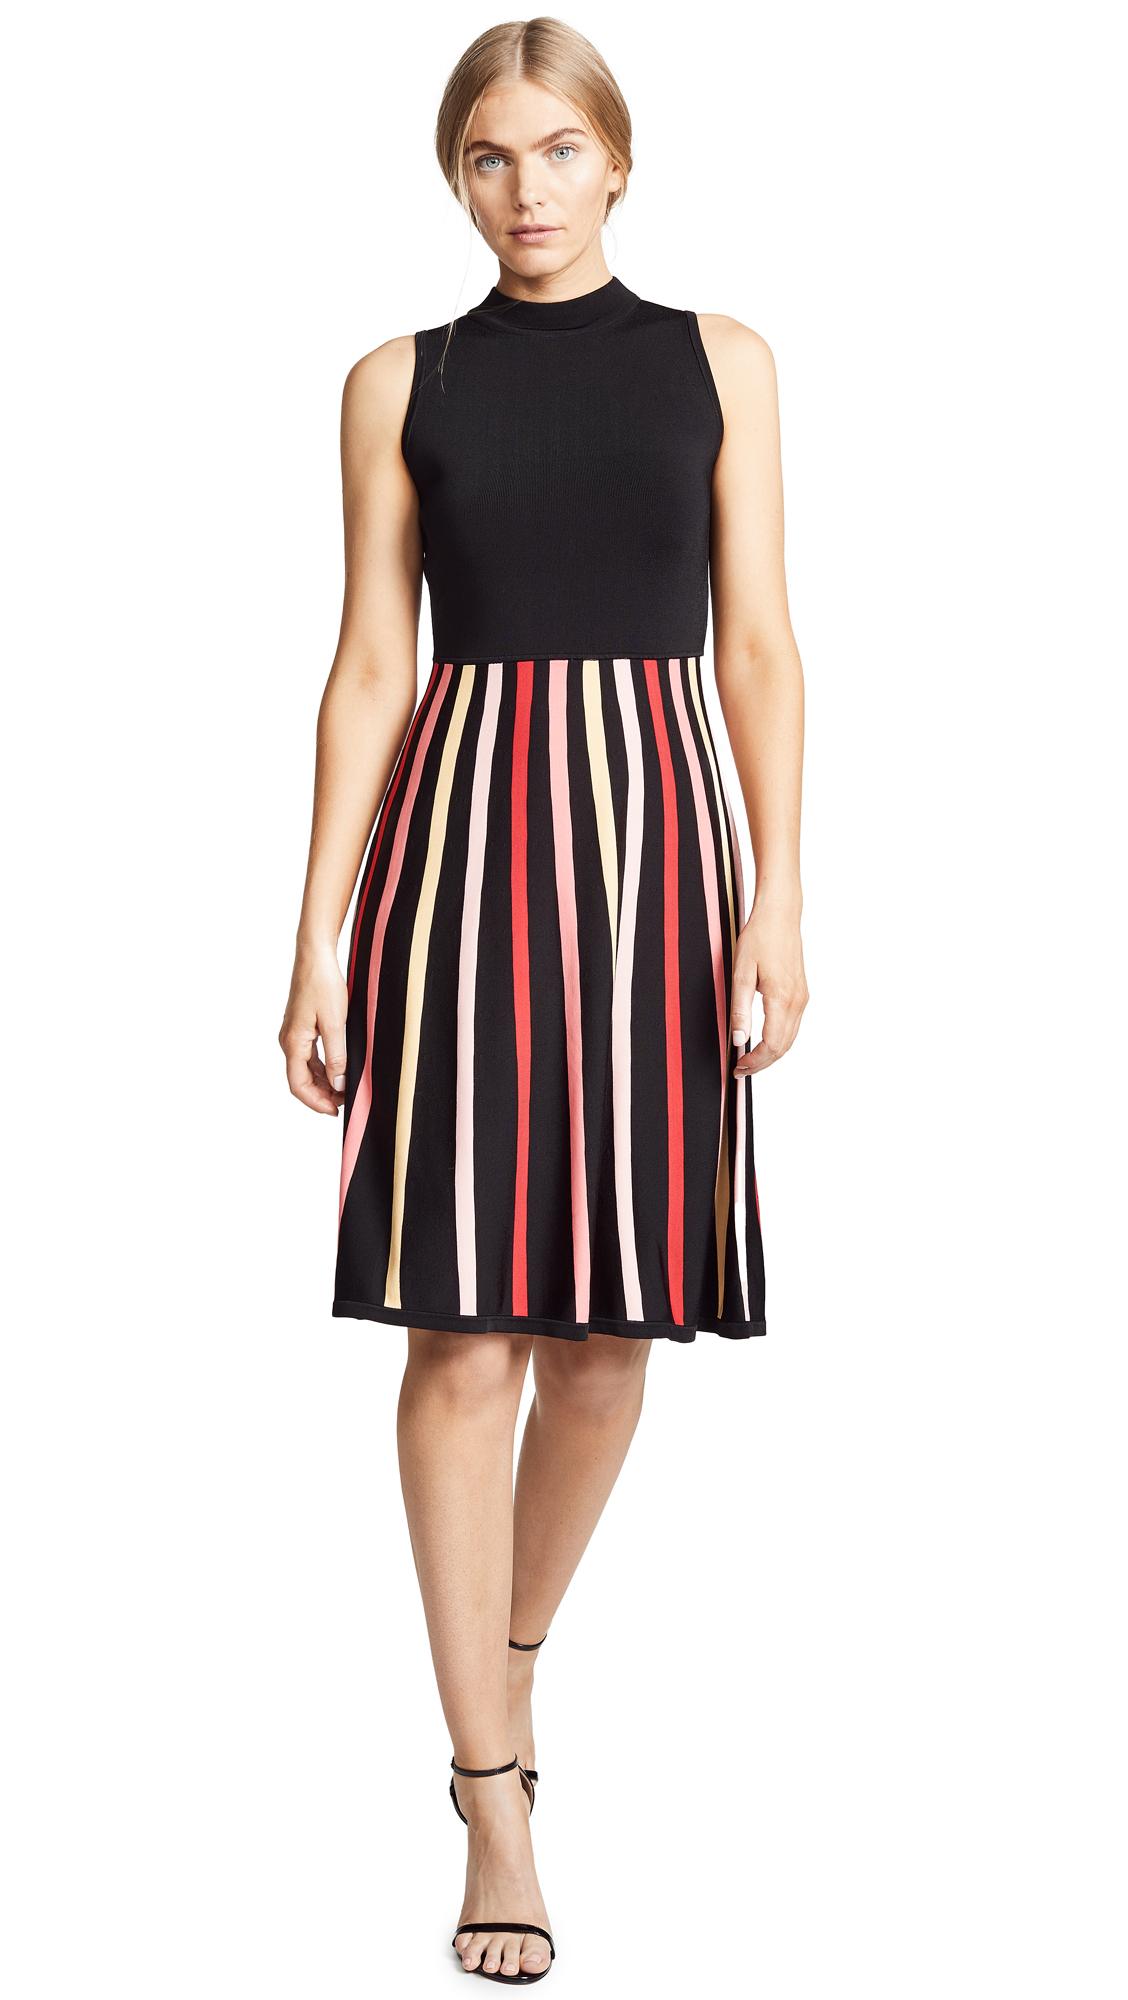 Shoshanna Kendall Dress